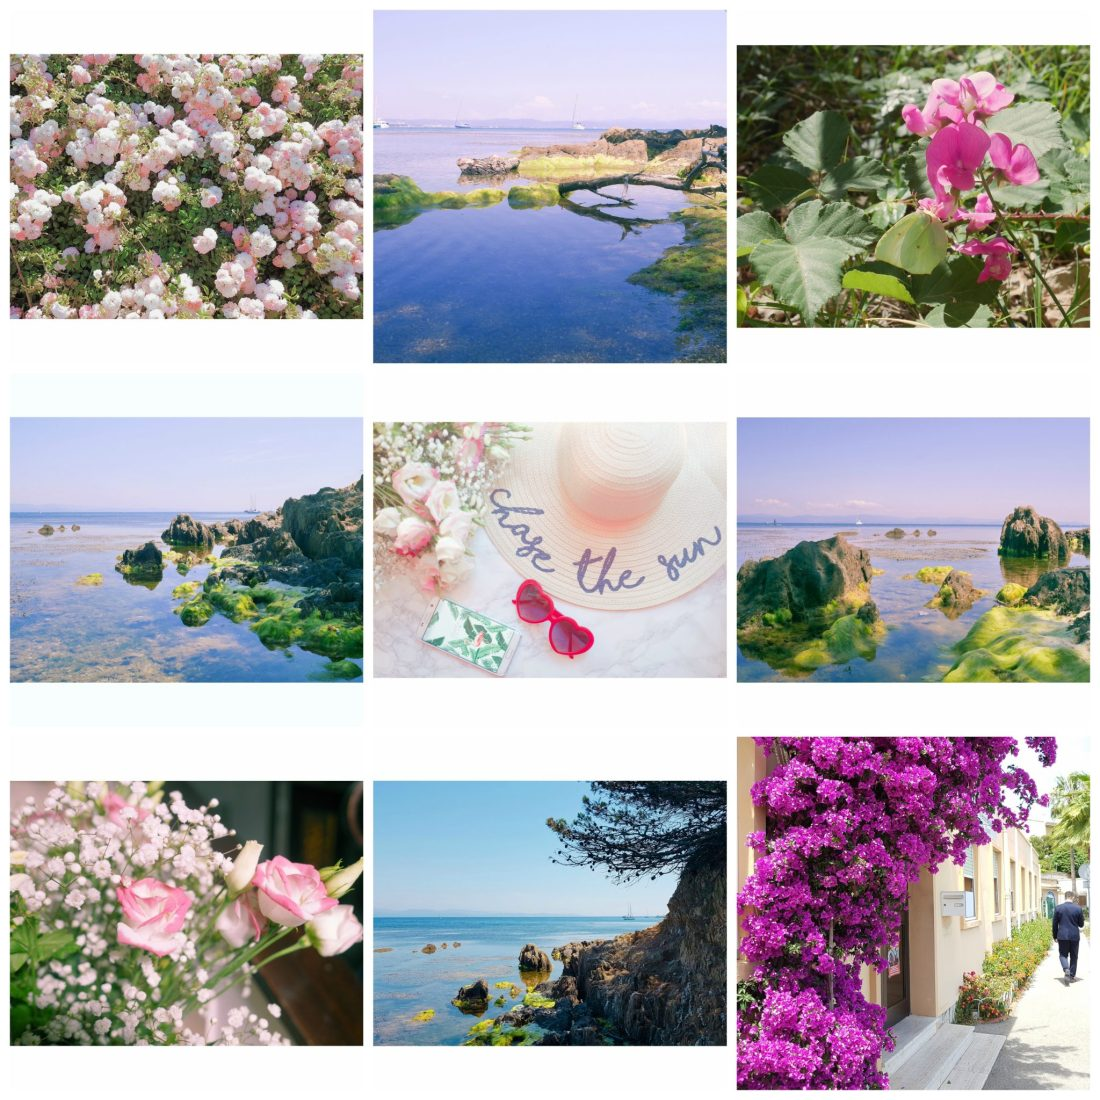 les-5-jolies-choses-de-juin